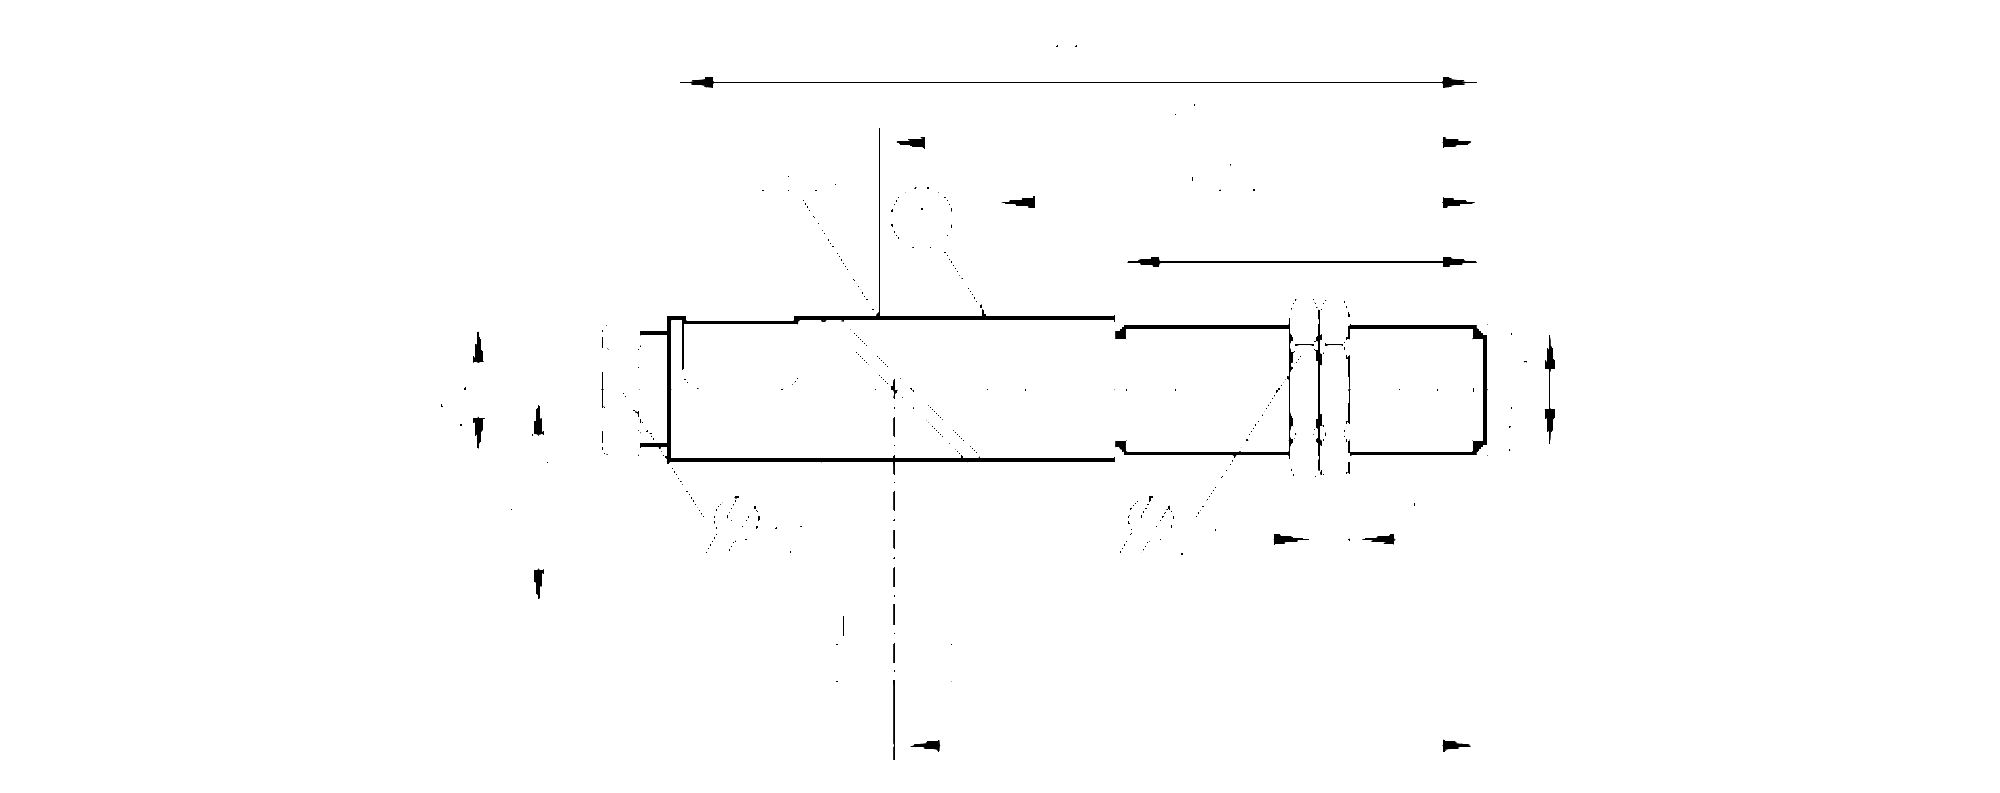 kg0008 - capacitive sensor